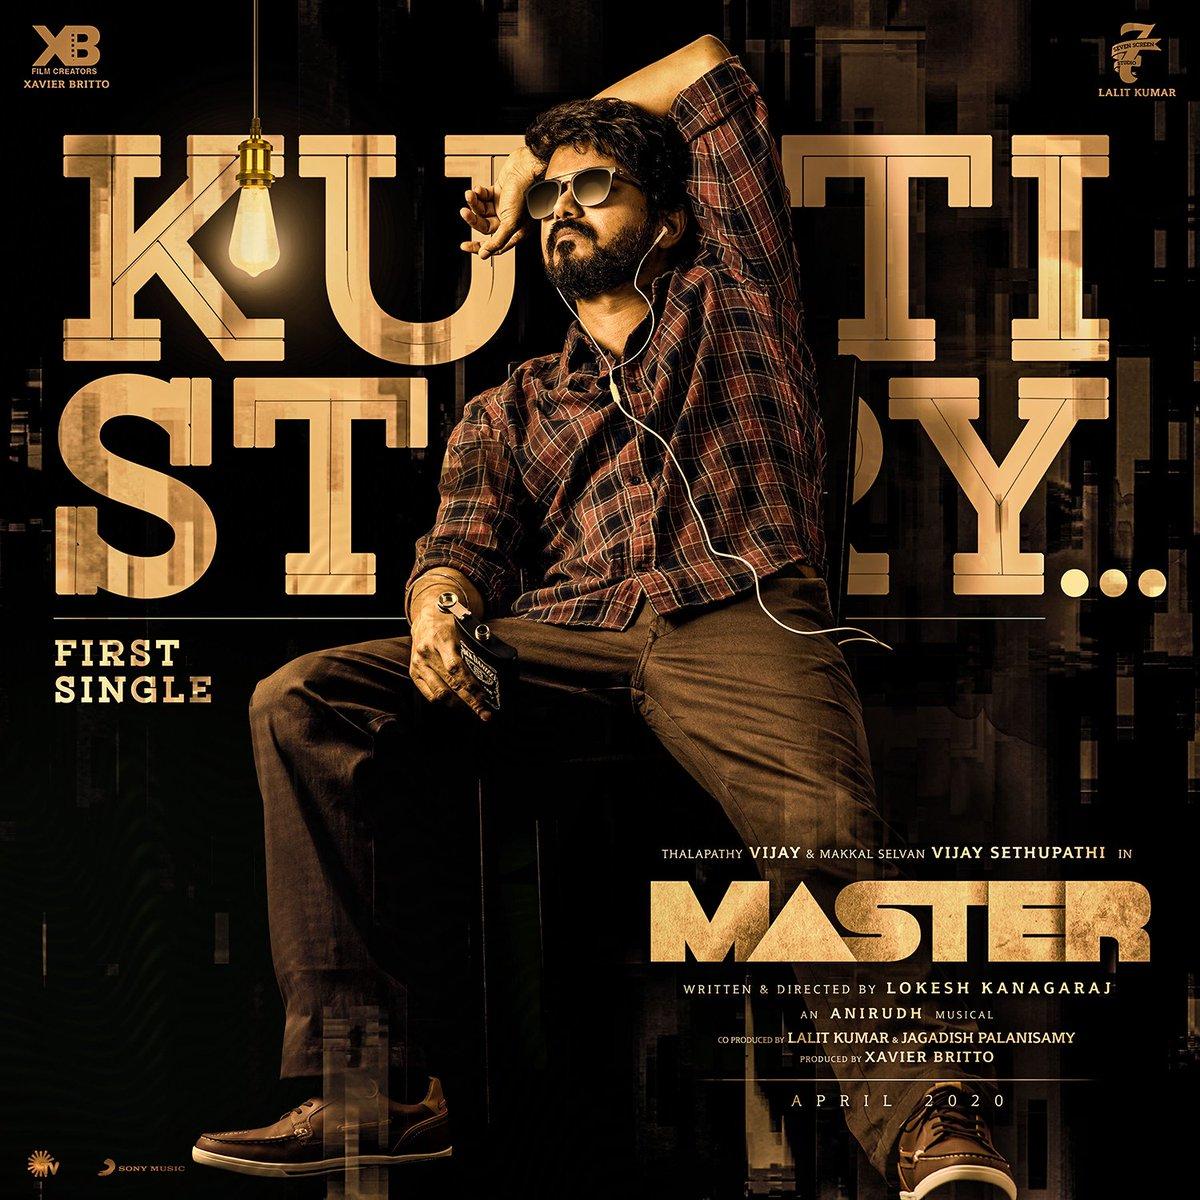 #KuttiStory #MasterFirstSingle...  #Master @actorvijay @Dir_Lokesh @VijaySethuOffl @anirudhofficial @Jagadishbliss @Lalit_SevenScr @gopiprasannaa @MalavikaM_  @XBFilmCreators @imKBRshanthnu @andrea_jeremiah @SonyMusicSouth